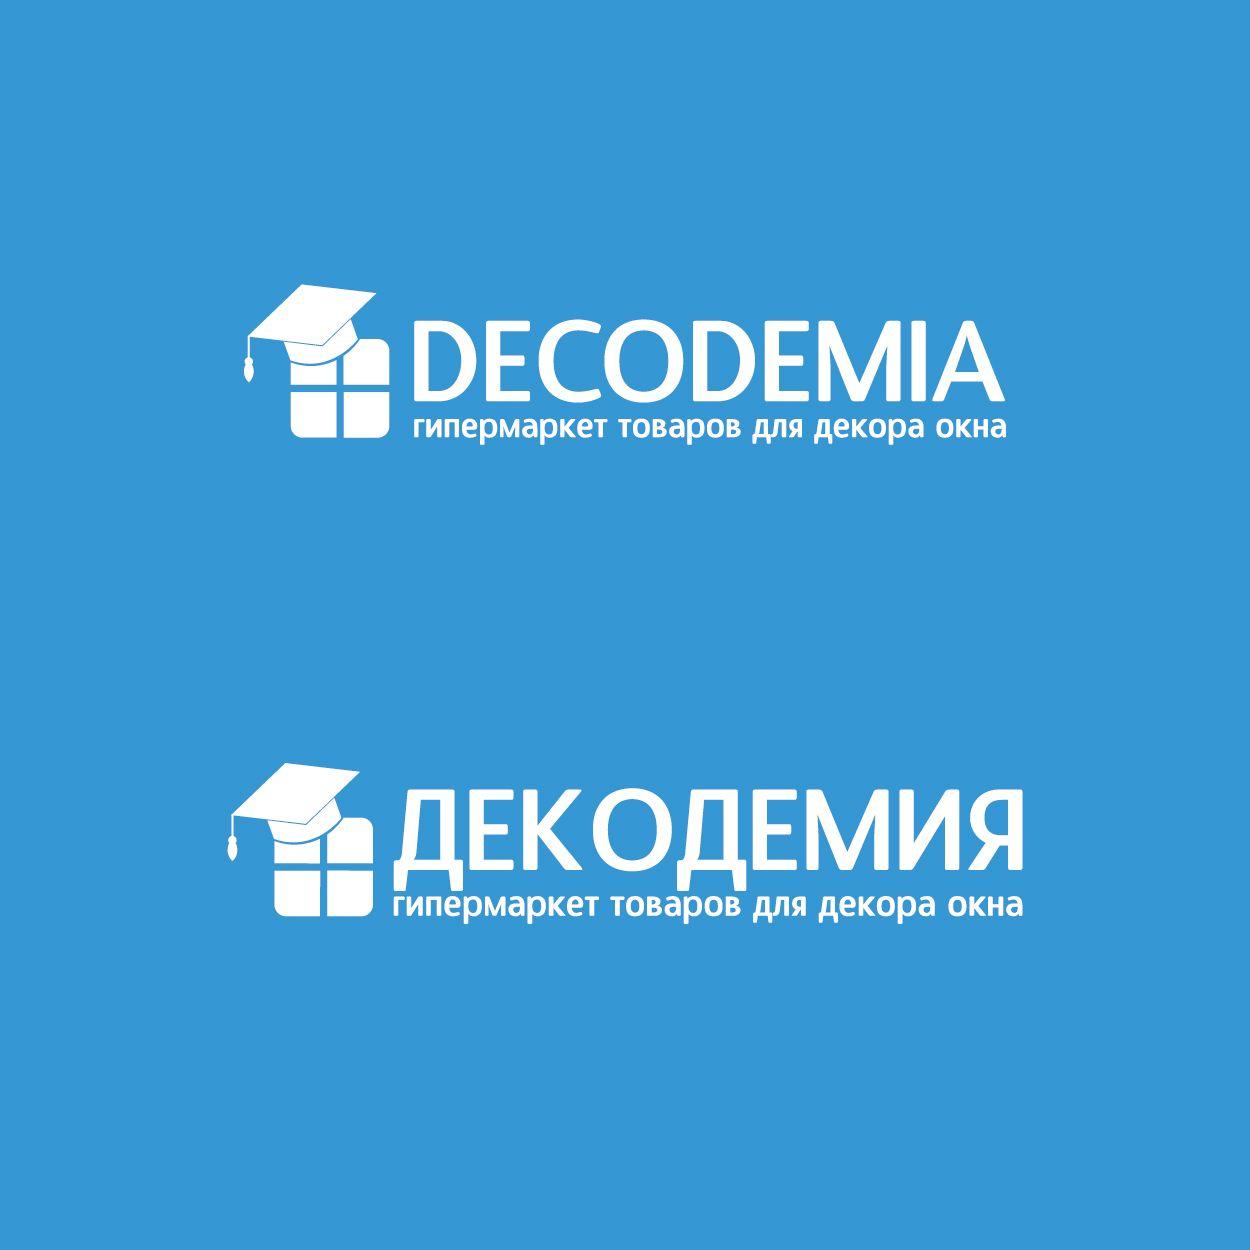 Логотип интернет-магазина  - дизайнер klyax